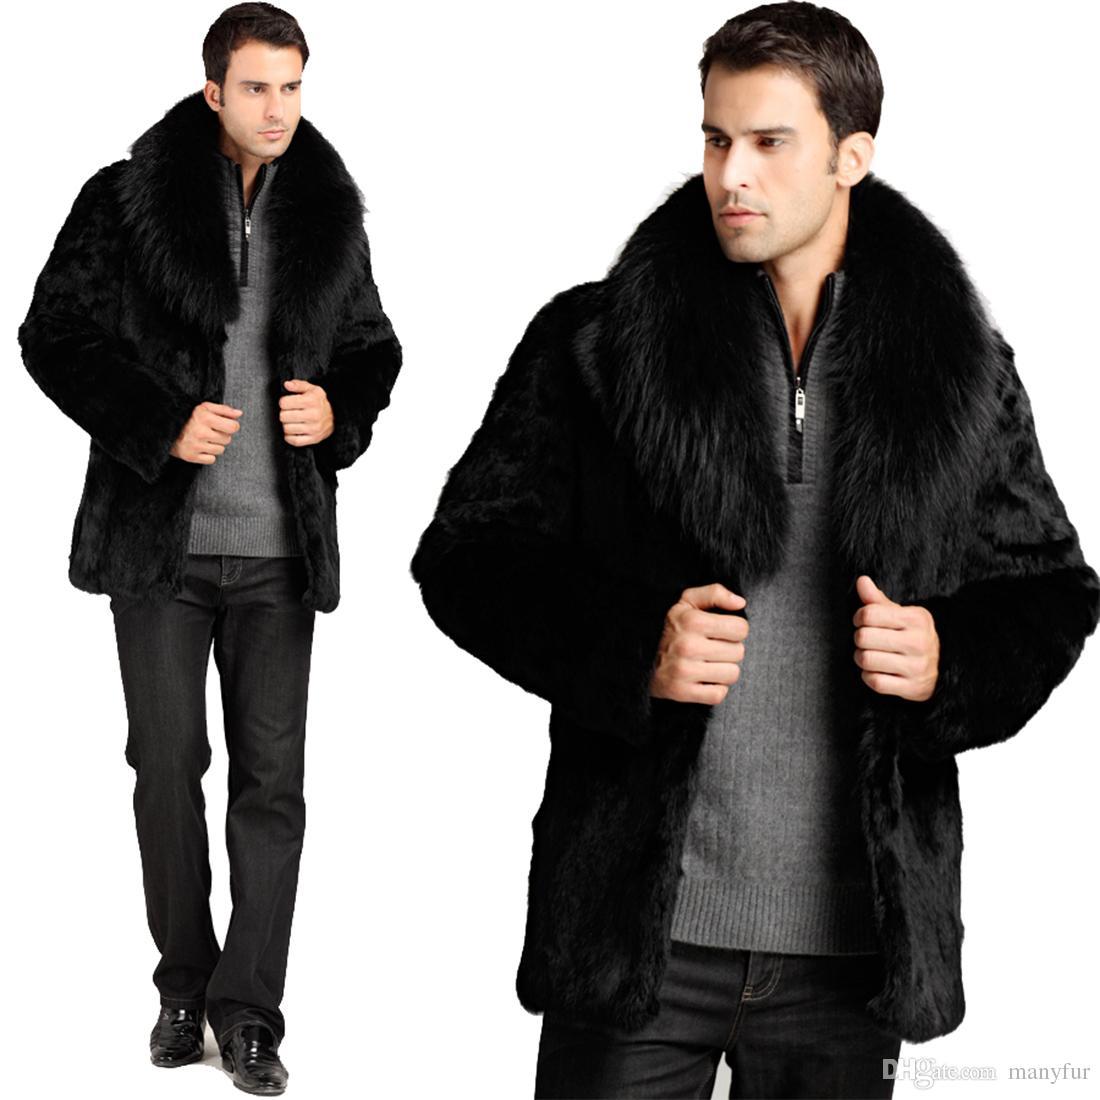 Mens jacket fur - Manyfurs Men S Fur Coat Male Genuine Top Rabbit Fur Men S Fox Fur Collar Jacket Detachable Collar Black Color Male Genuine Rabbit Fur Coat Men Fur Coat Male